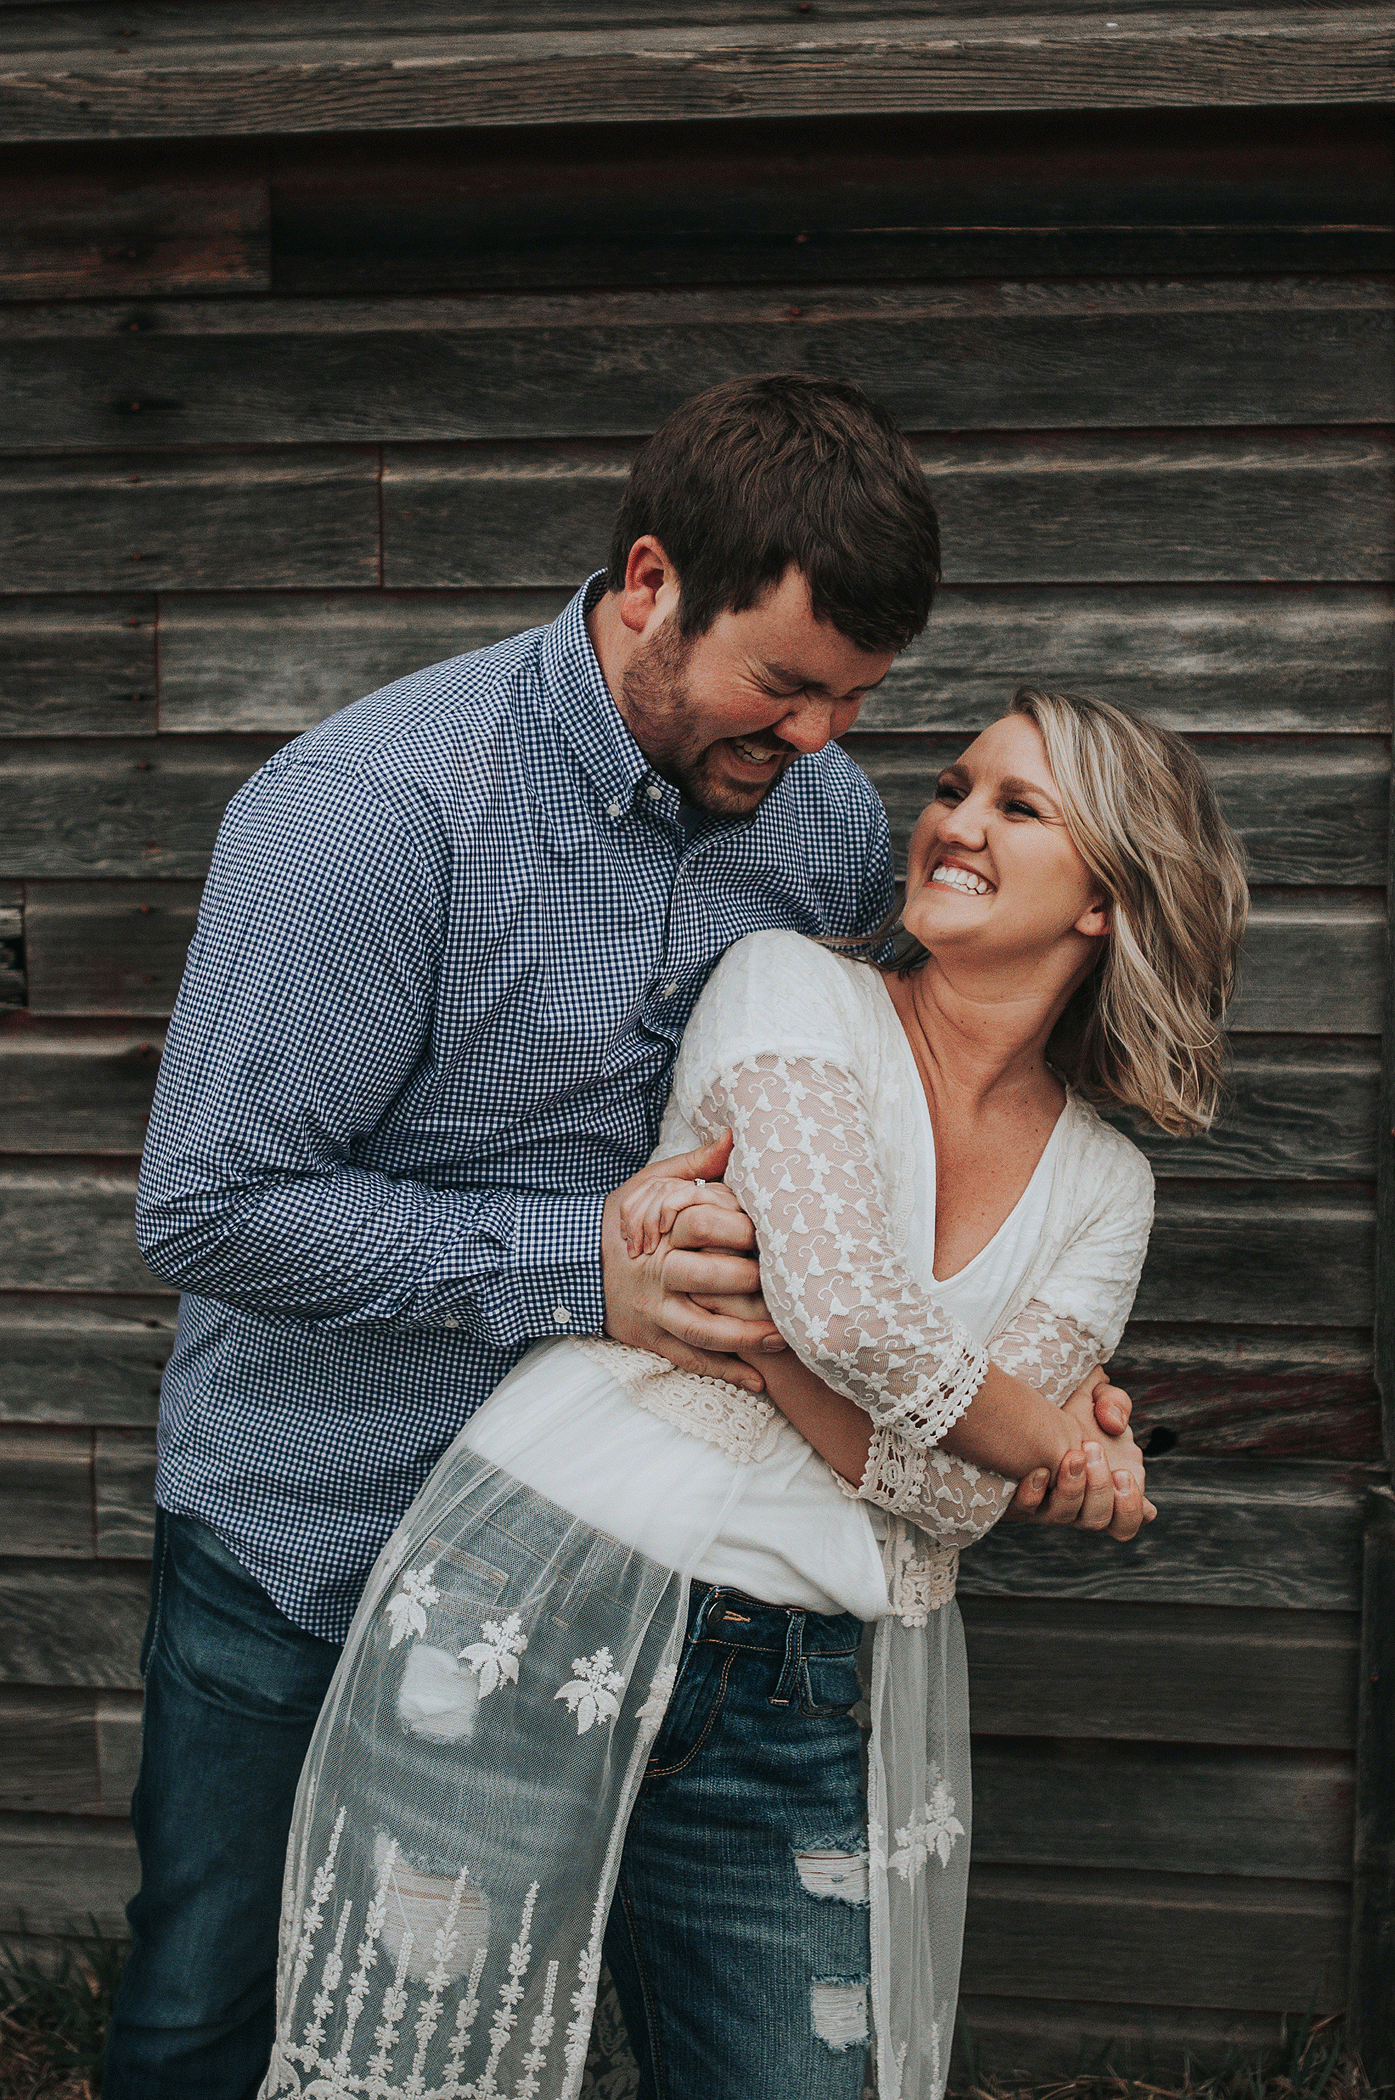 kaylie-sirek-nebraska-wedding-engagement-photographer-photography-grand-island-kearney-hastings-lincoln-16.png